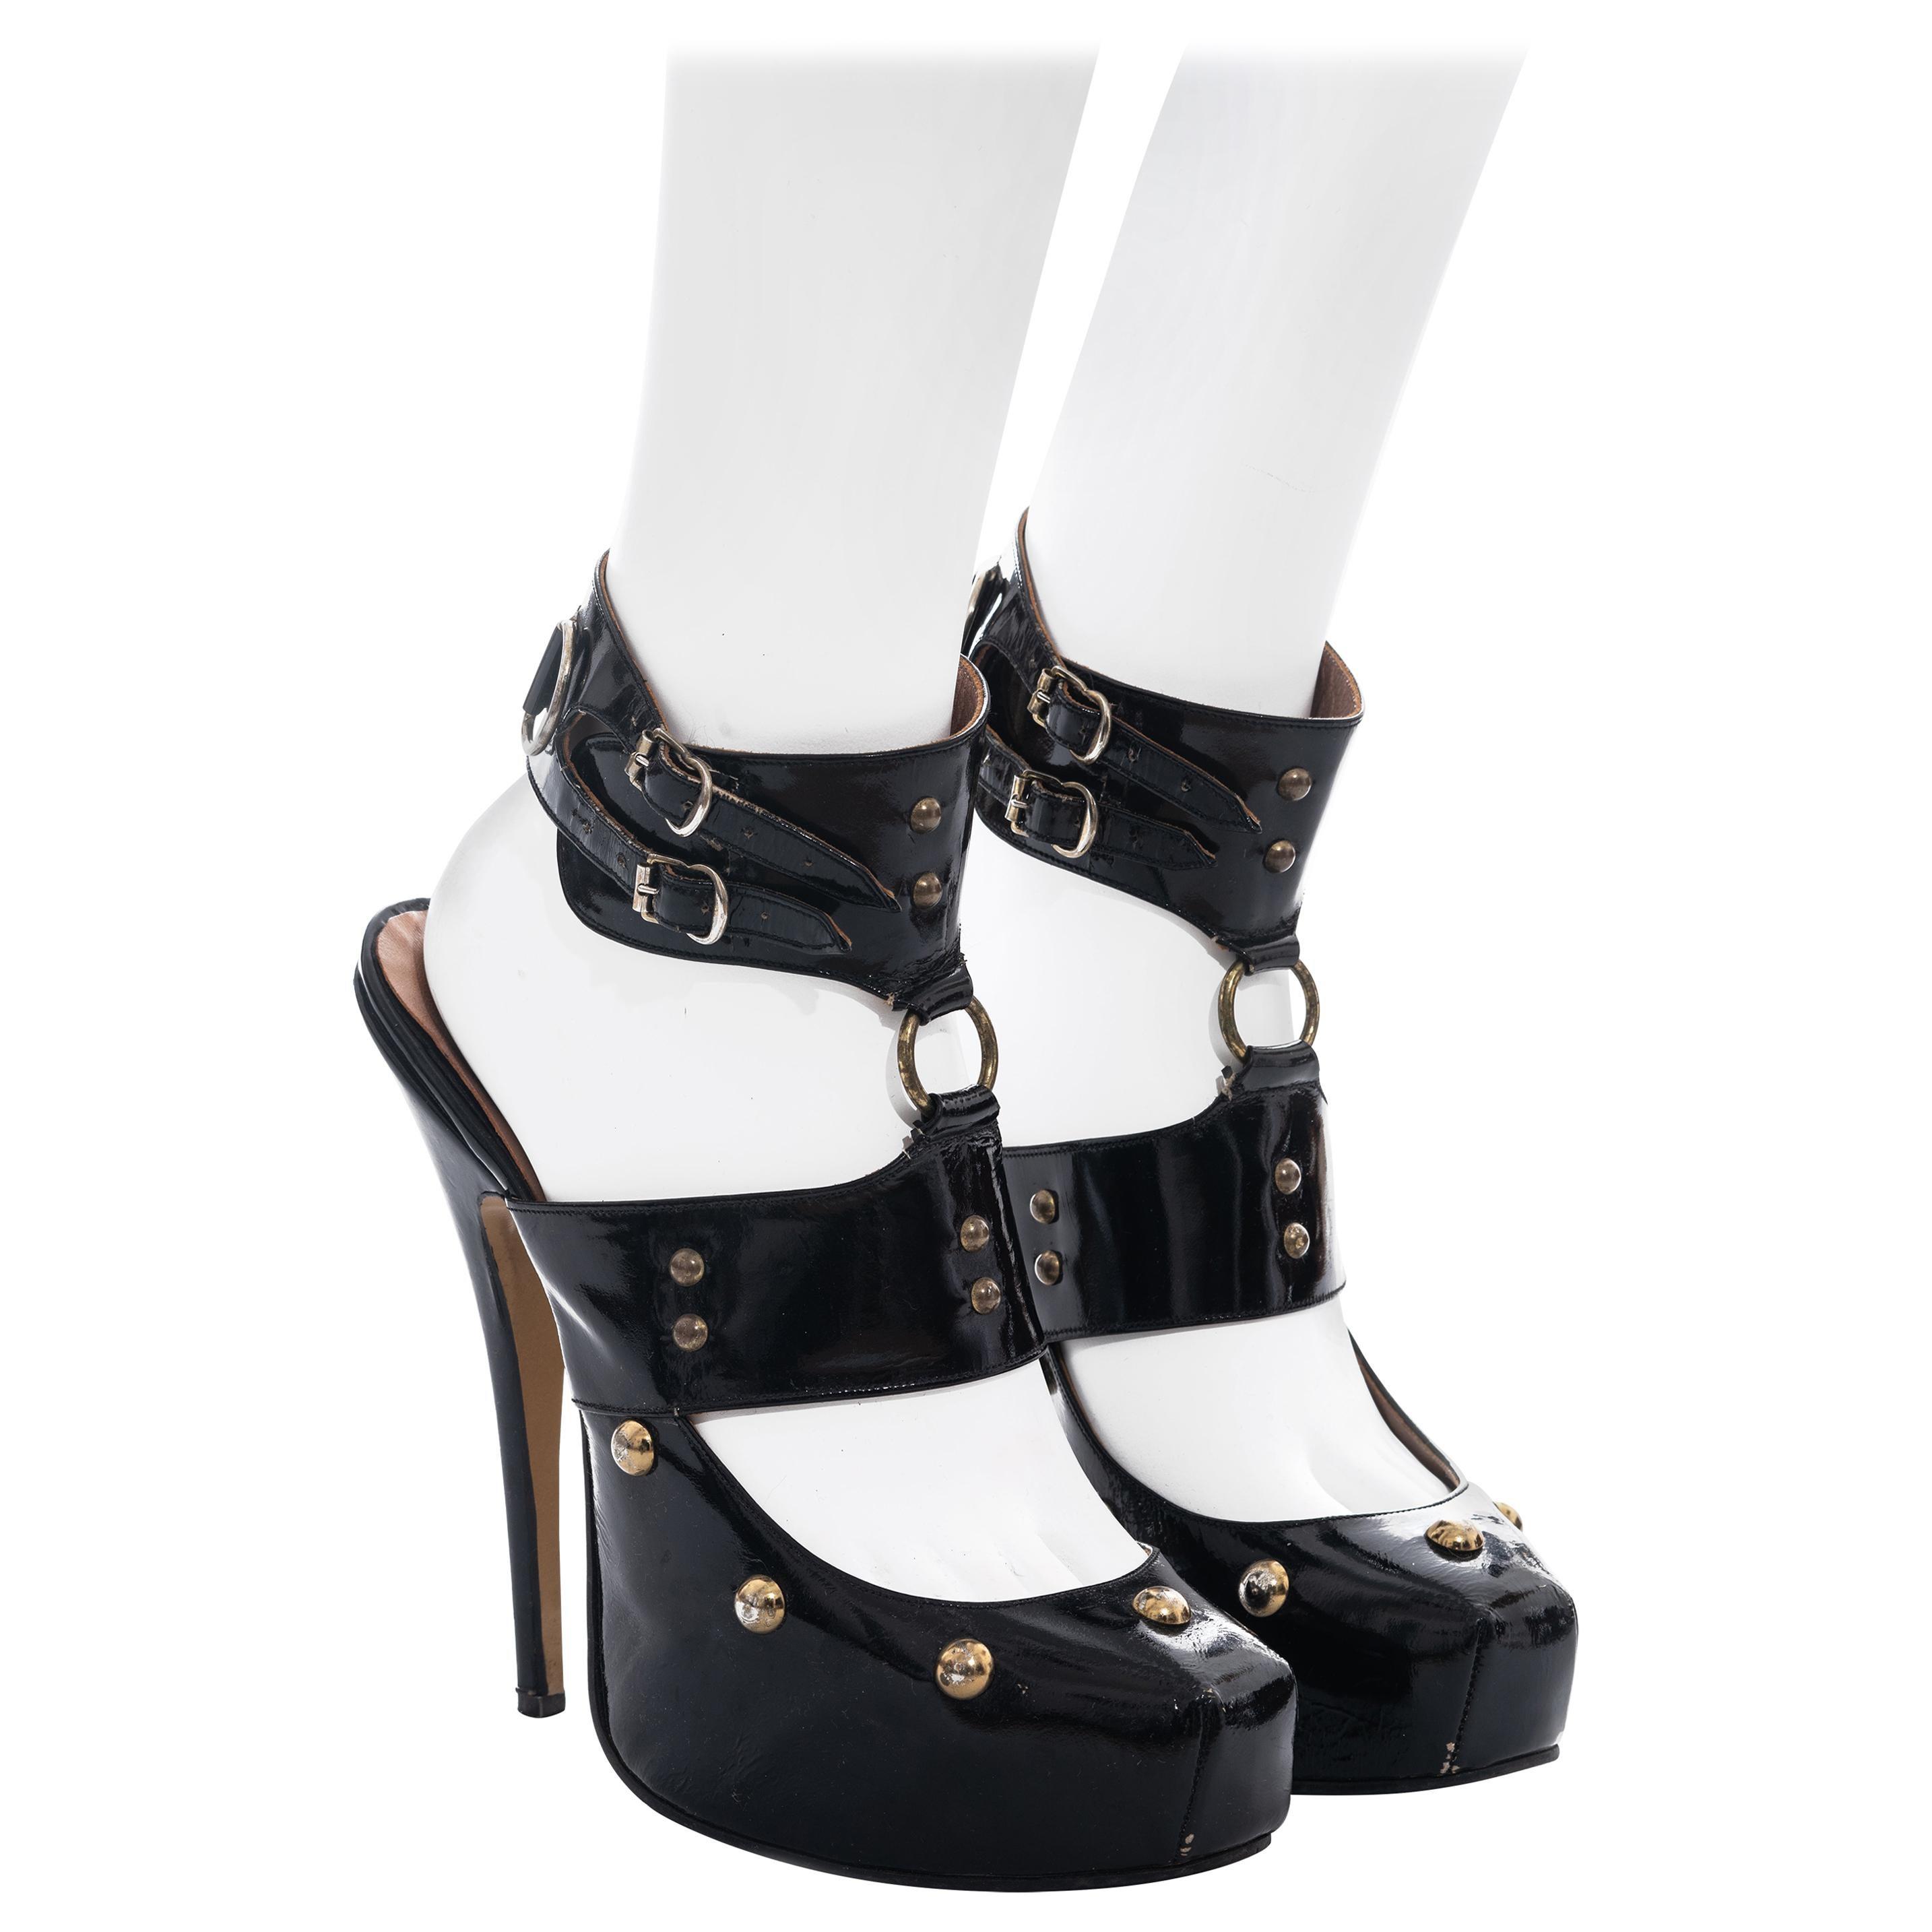 Vivienne Westwood black patent leather studded platform sandals, fw 1994